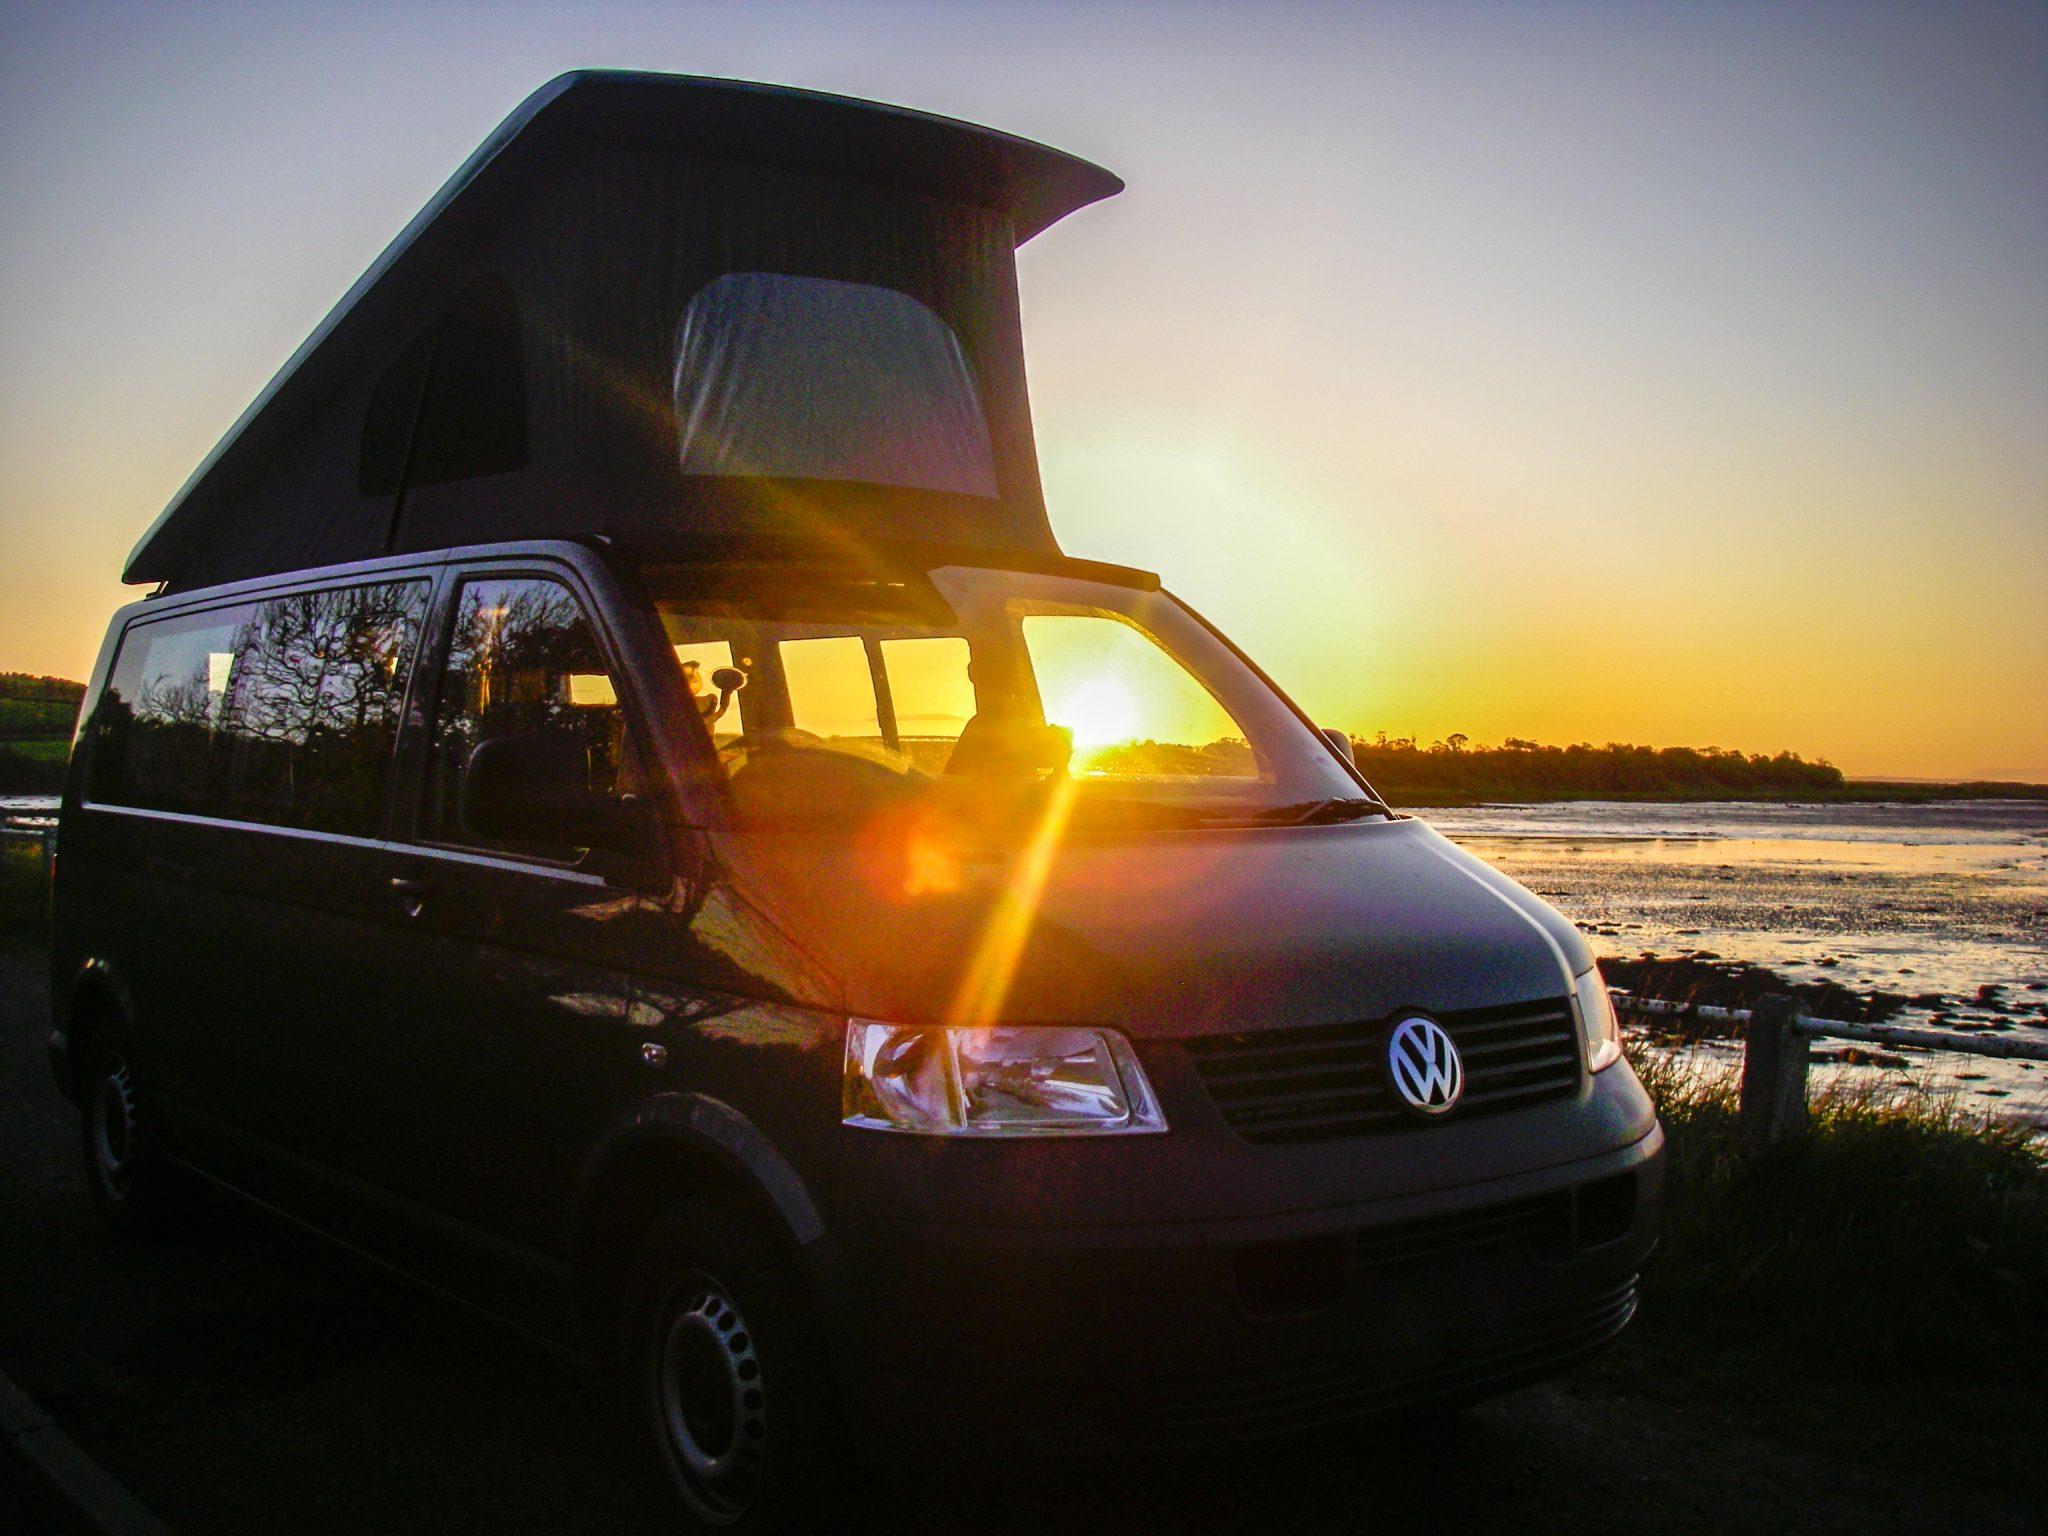 Jerba Campervan Sunset